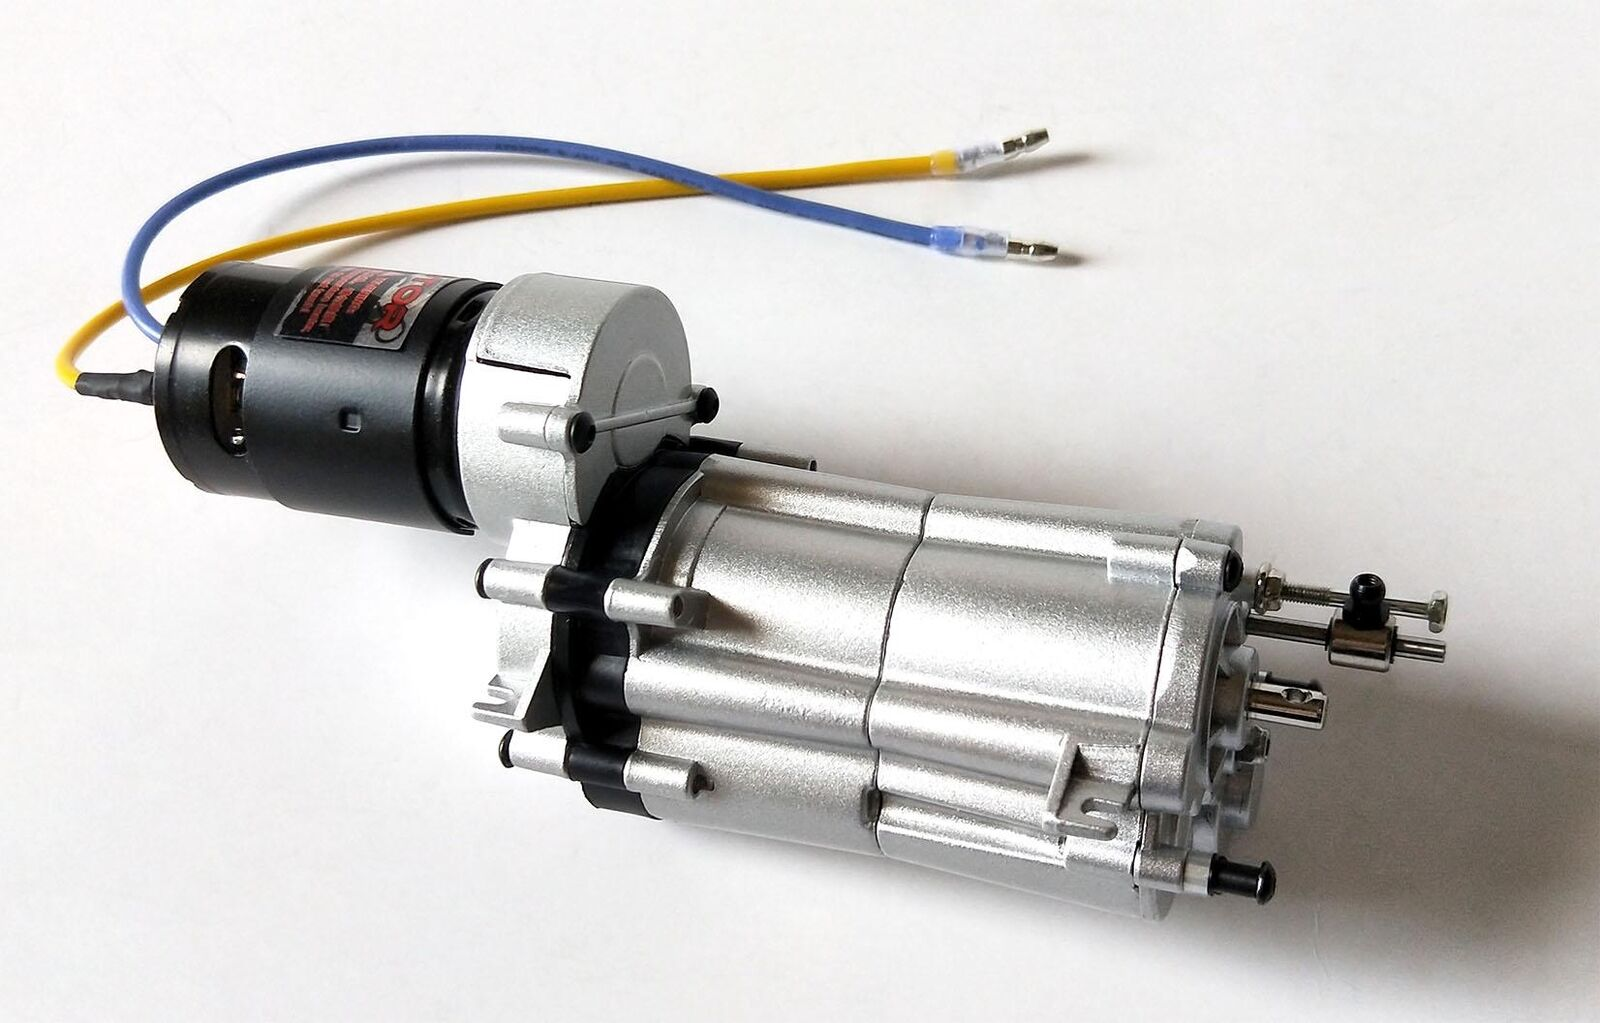 HG 1/10 caja de cambios de metal control de radio Asamblea para P407 44 Modelo de Carreras de recolección Rally sobre orugas